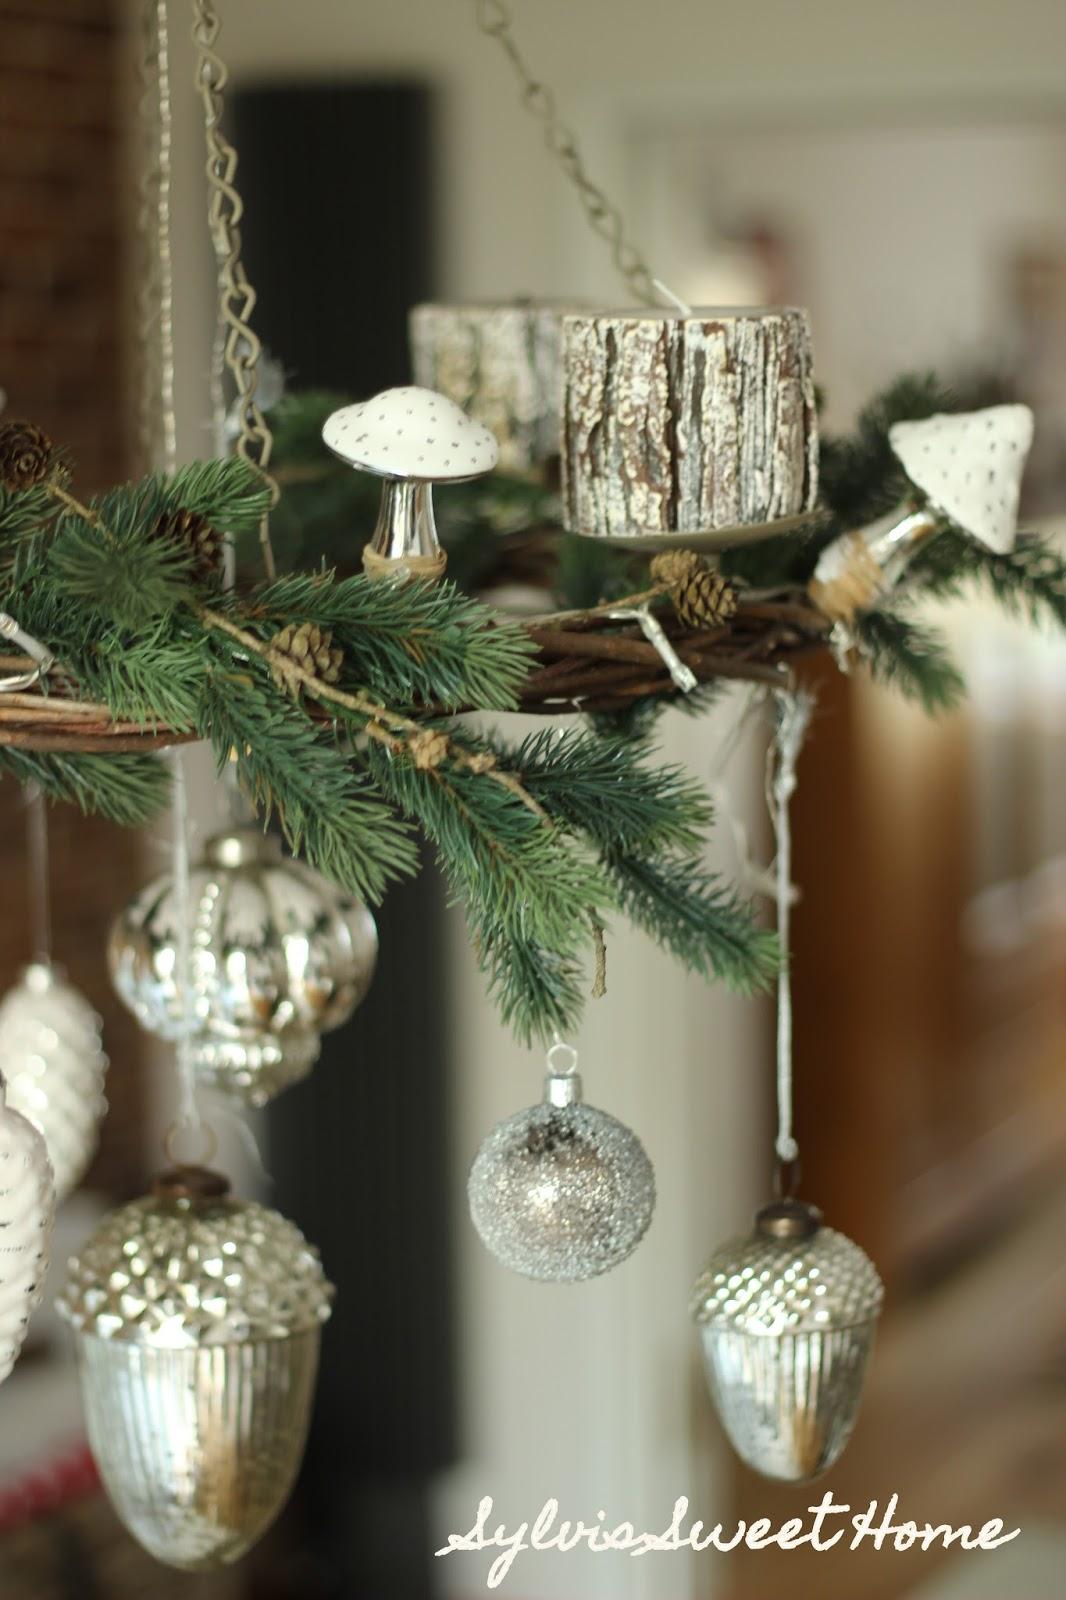 sylvis sweet home advent advent. Black Bedroom Furniture Sets. Home Design Ideas